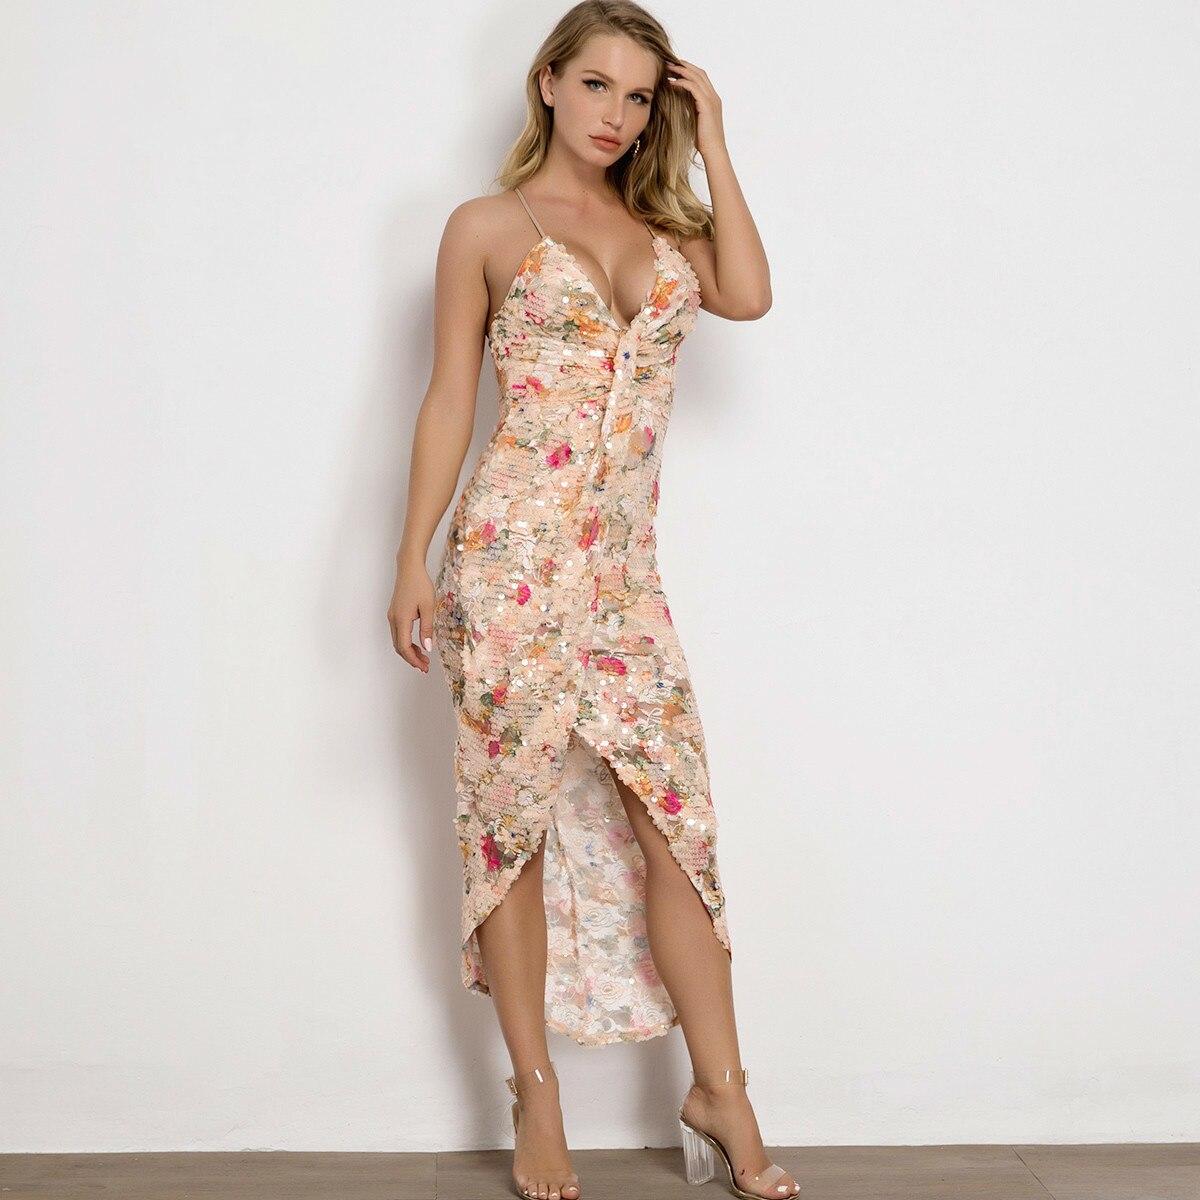 Causey Sexy V-neck Sequined Dress Women Spaghetti Strap Split Plus Size Dresses Elegant Bodycon Party Vestidos De Fiesta